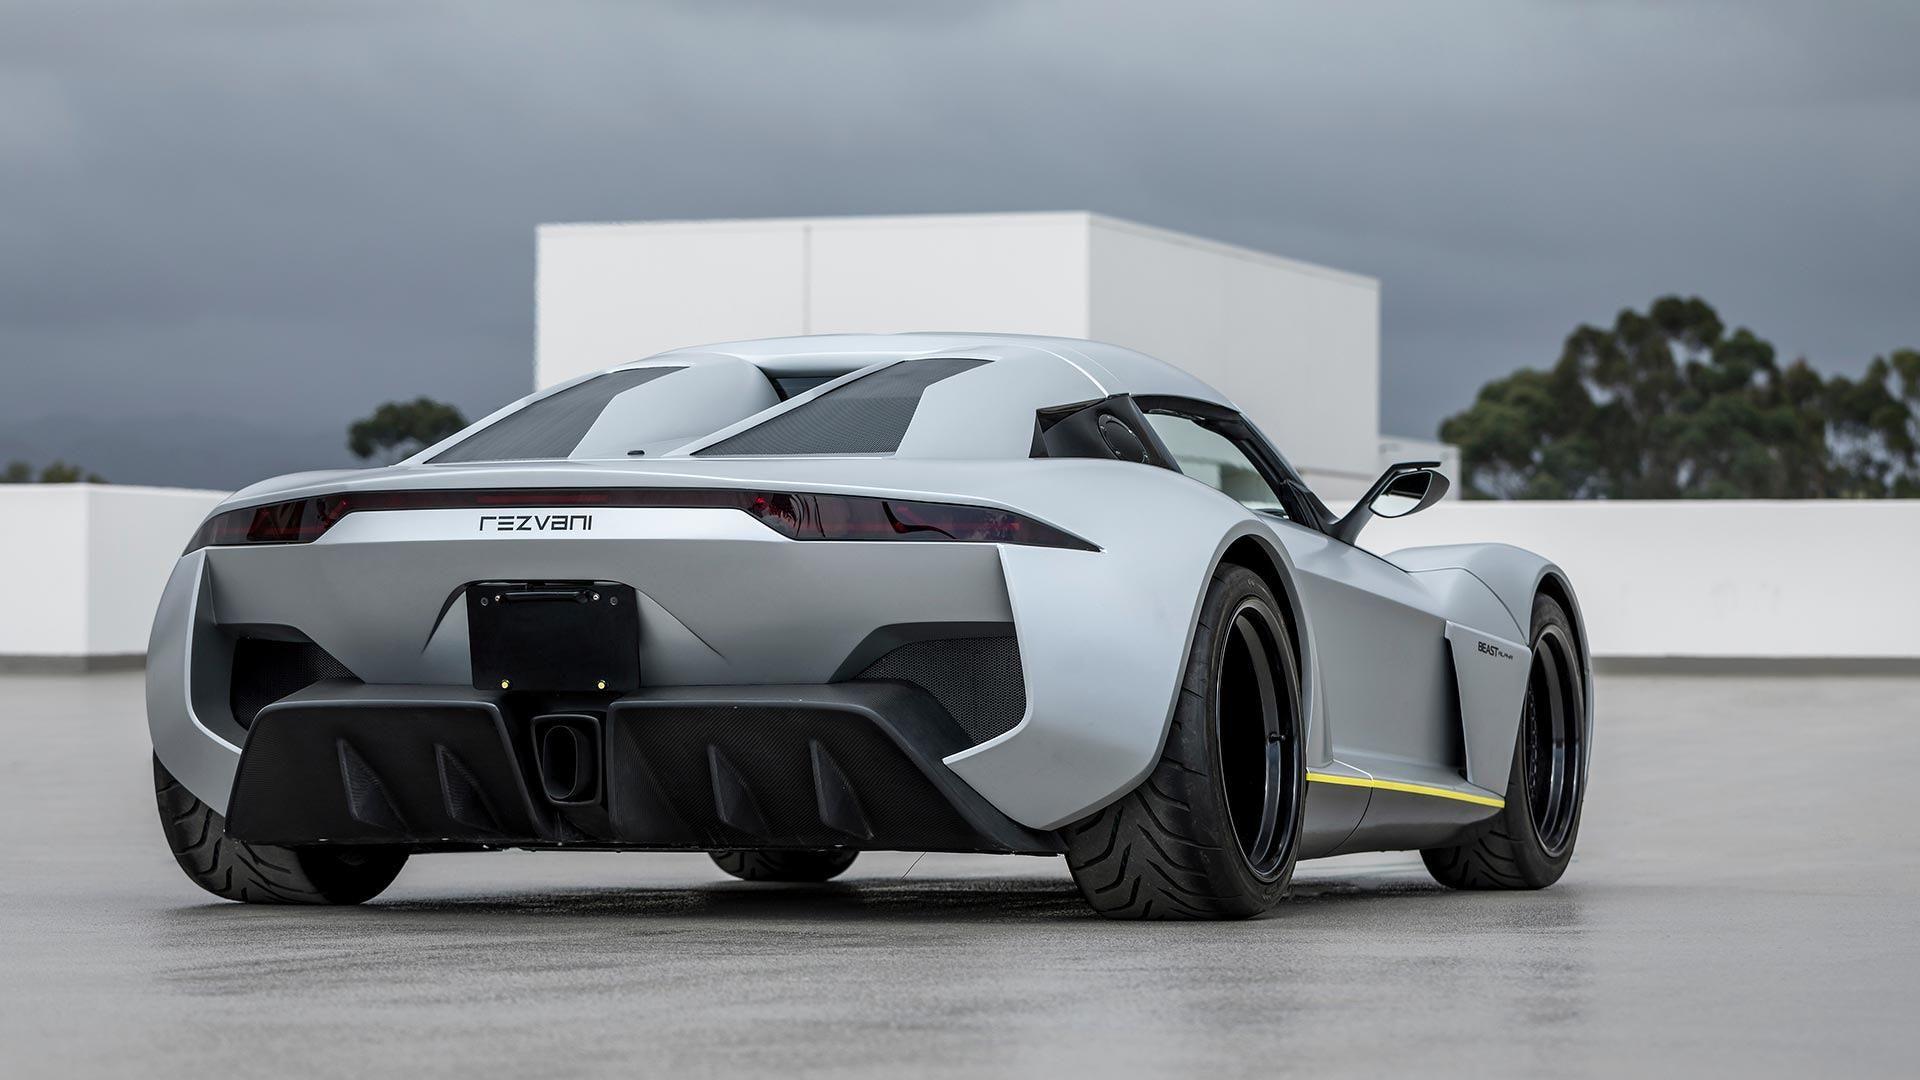 Rezvani Beast Alpha X Blackbird Is 700 Hp Spy Plane For The Road Cool Sports Cars Spy Plane Lux Cars